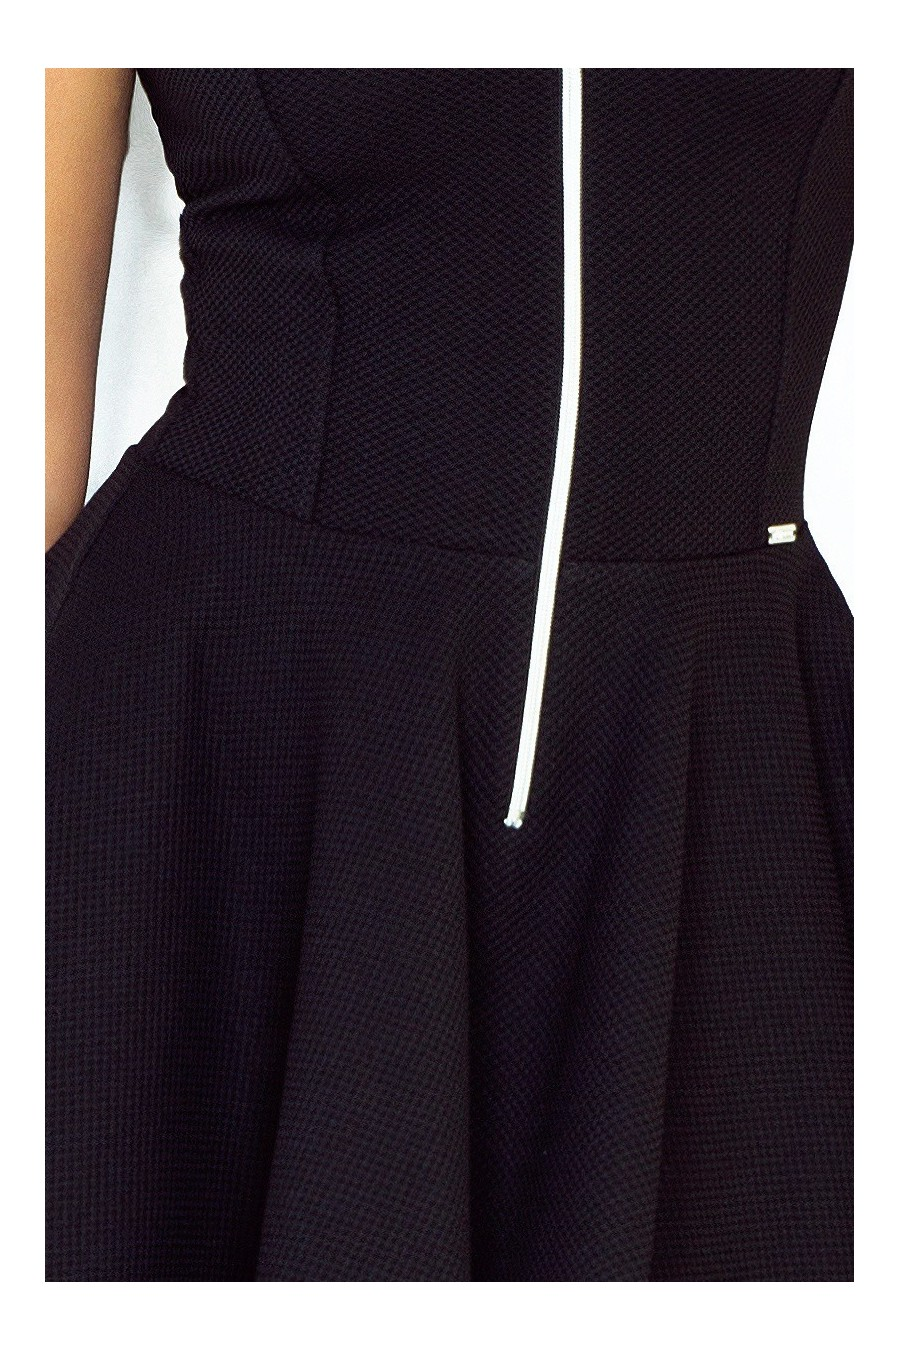 šaty - cerne 123-10